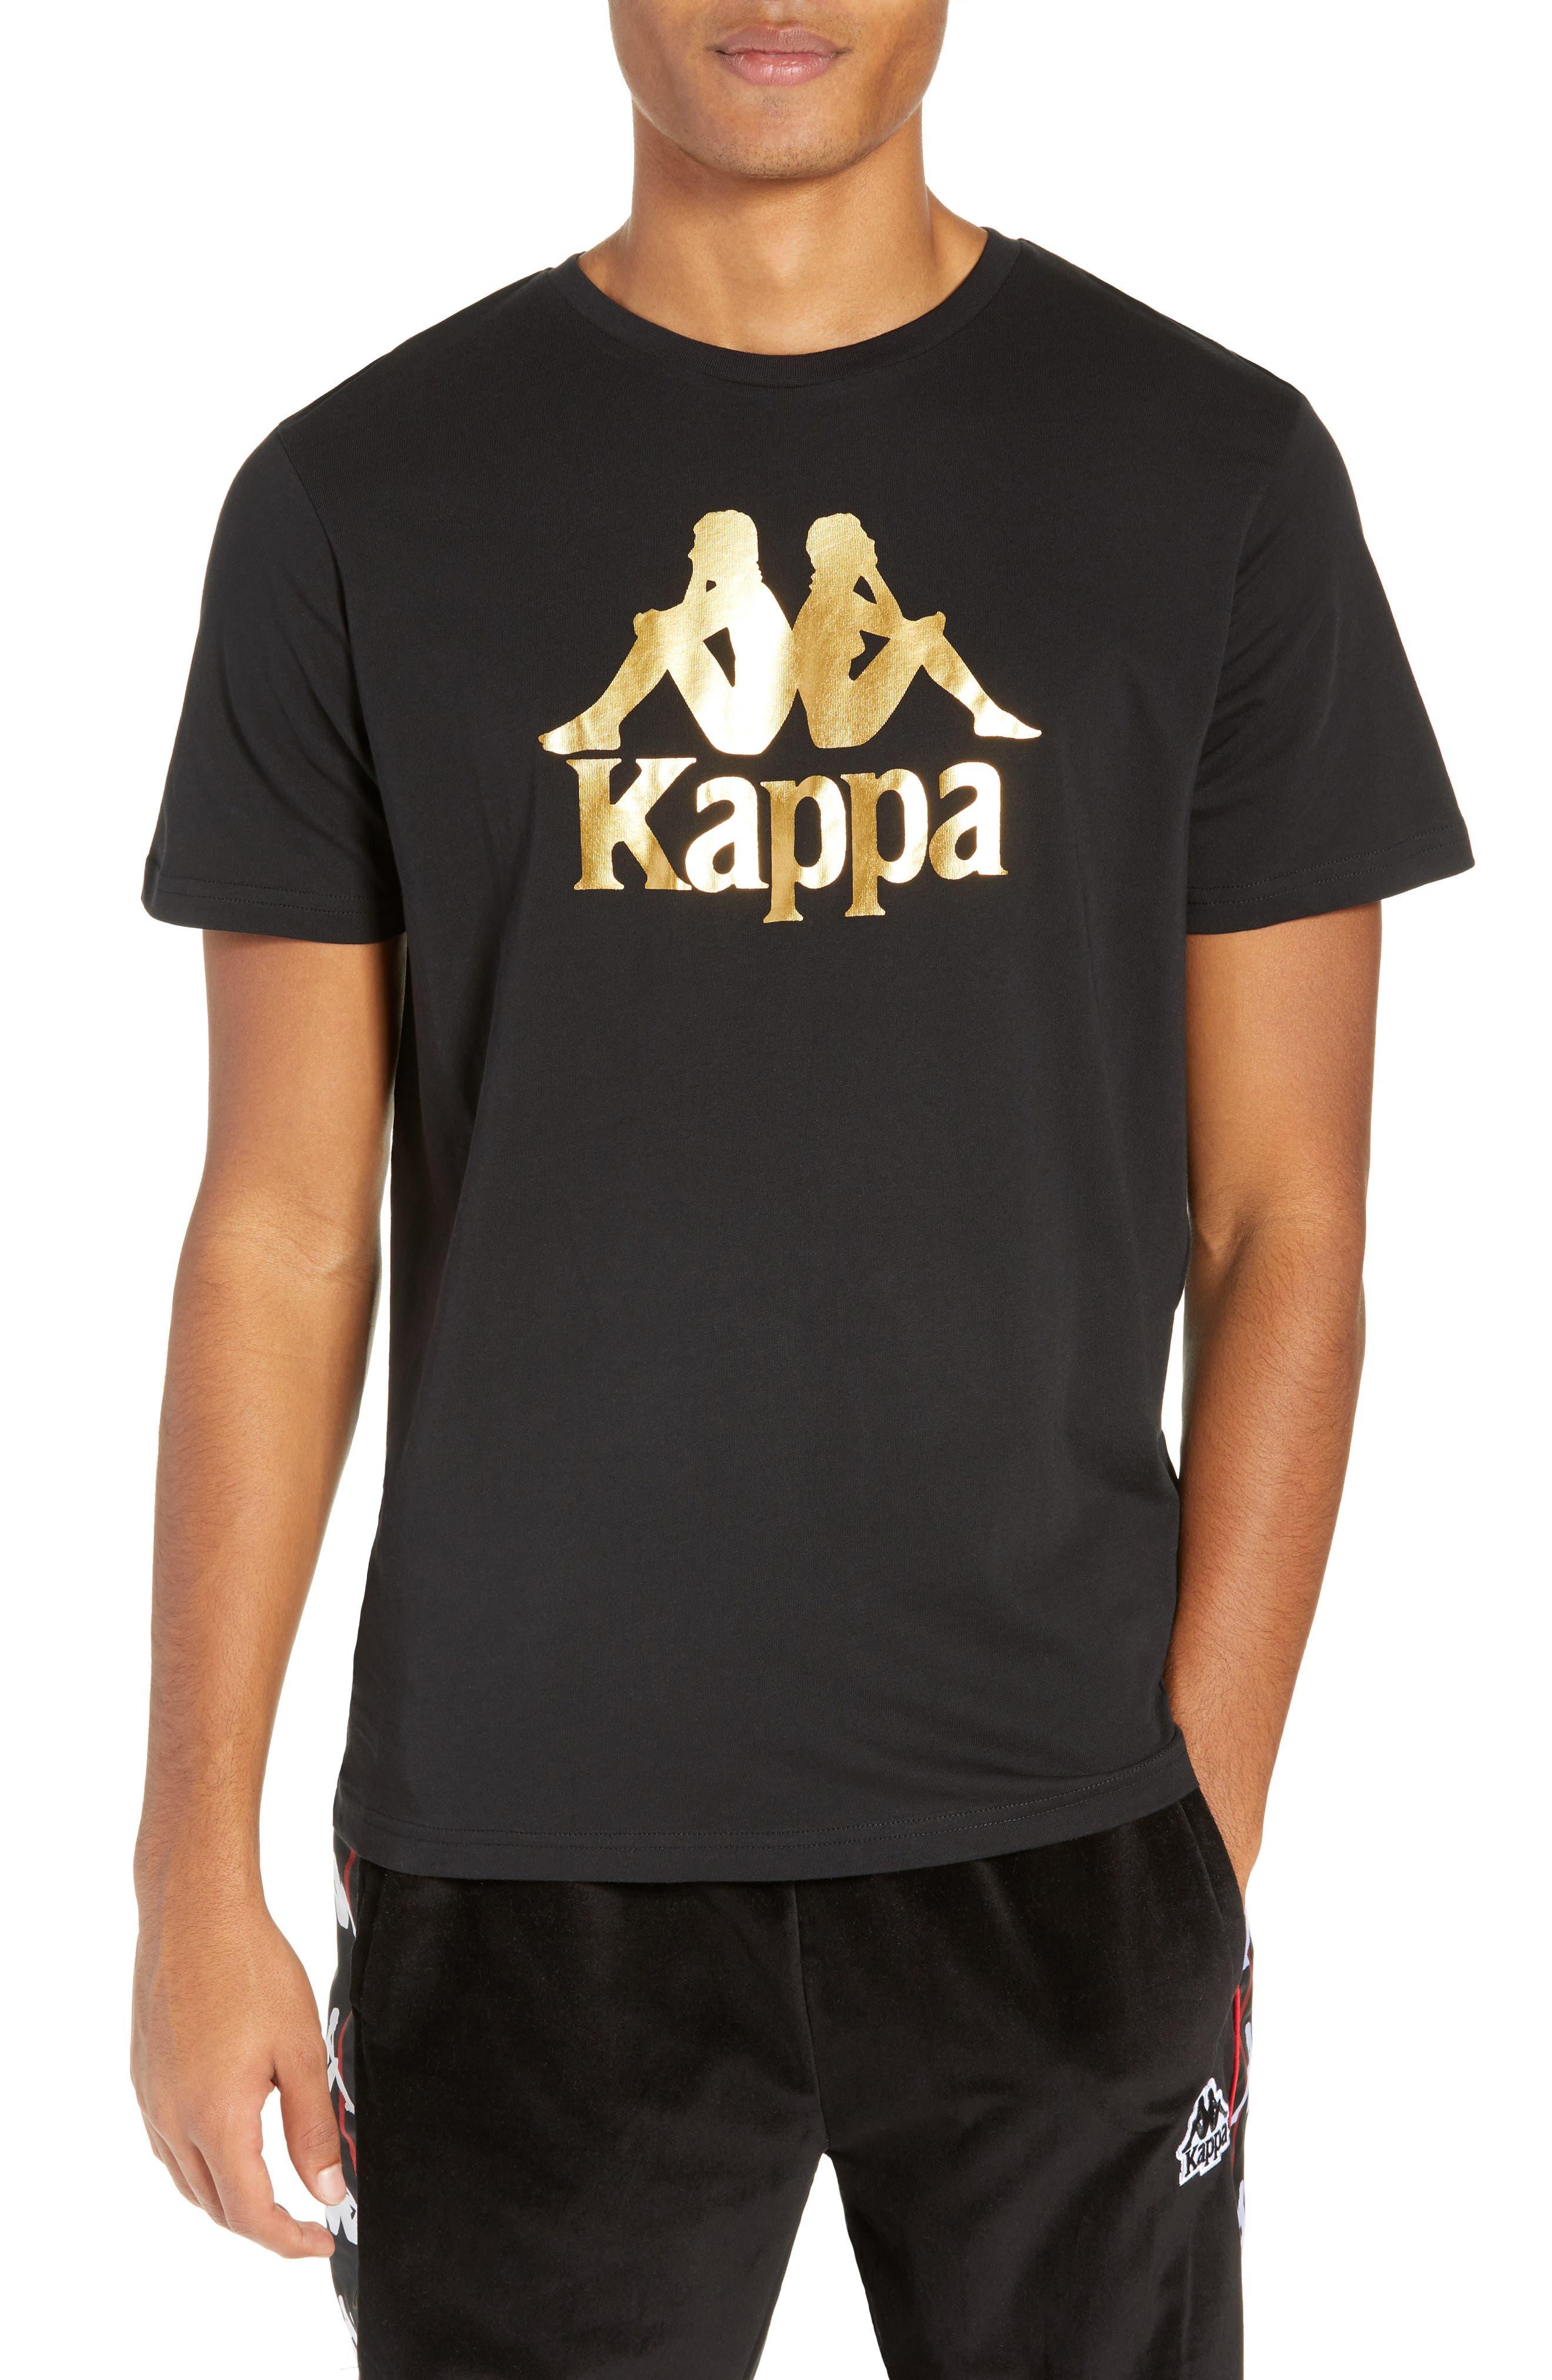 Kappa Estessi Graphic T-Shirt, Black